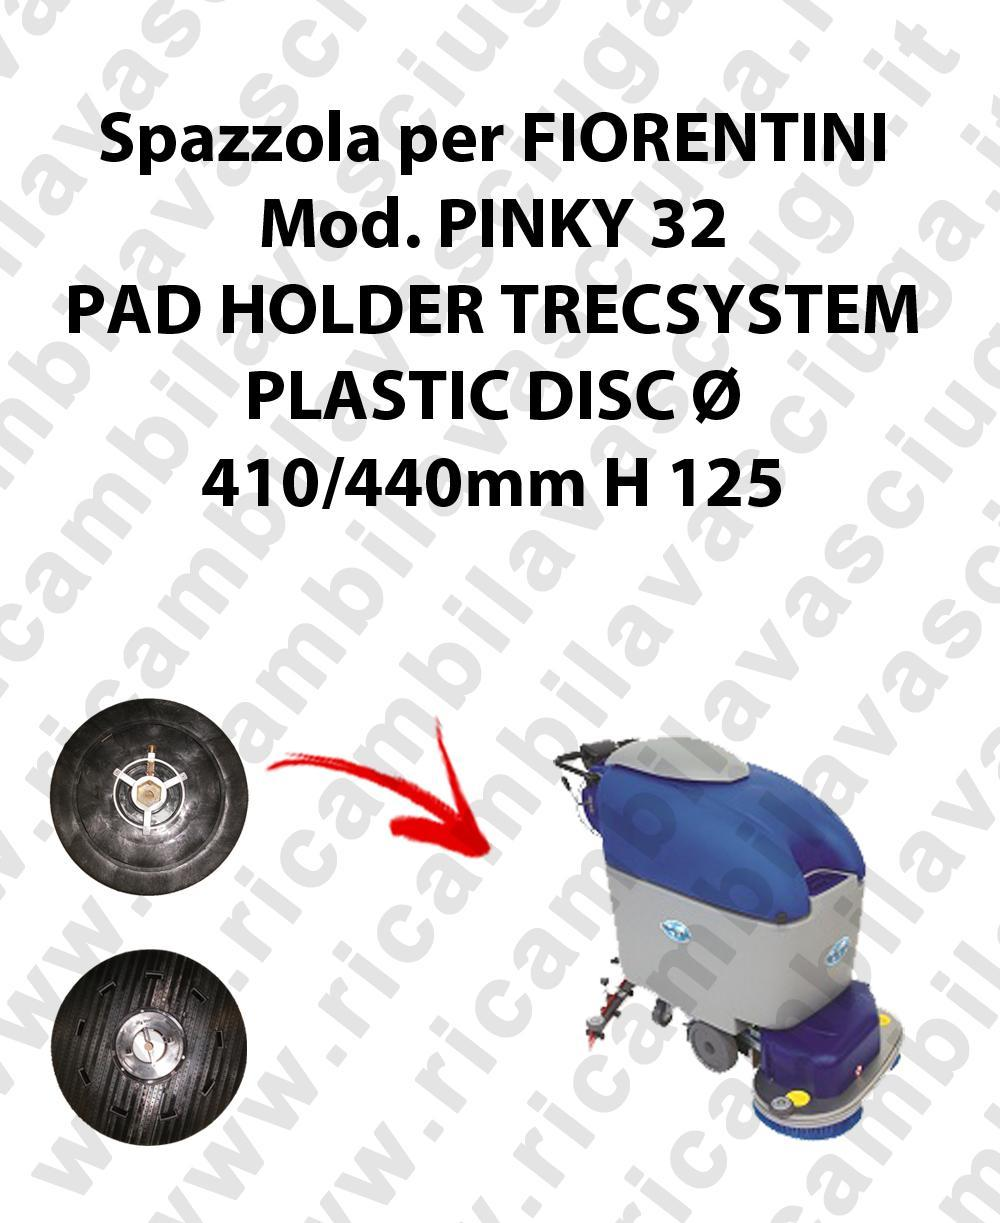 PAD HOLDER TRECSYSTEM  for scrubber dryer FIORENTINI Model PINKY 32